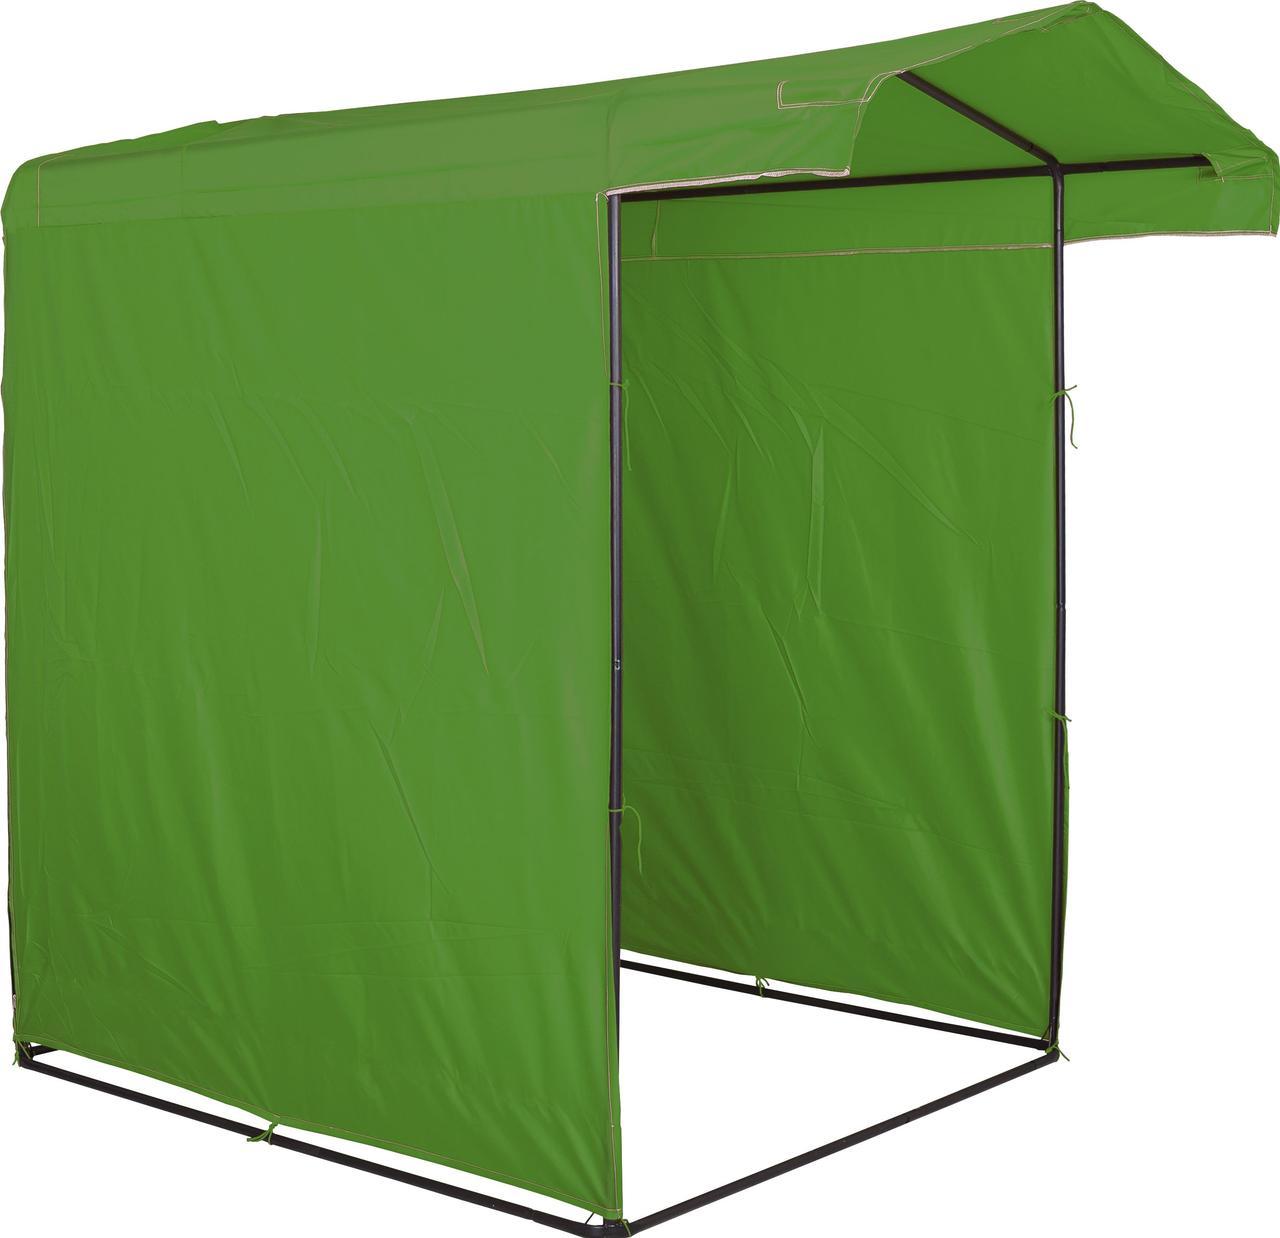 Тент на торговую палатку 1,5х1,5 м